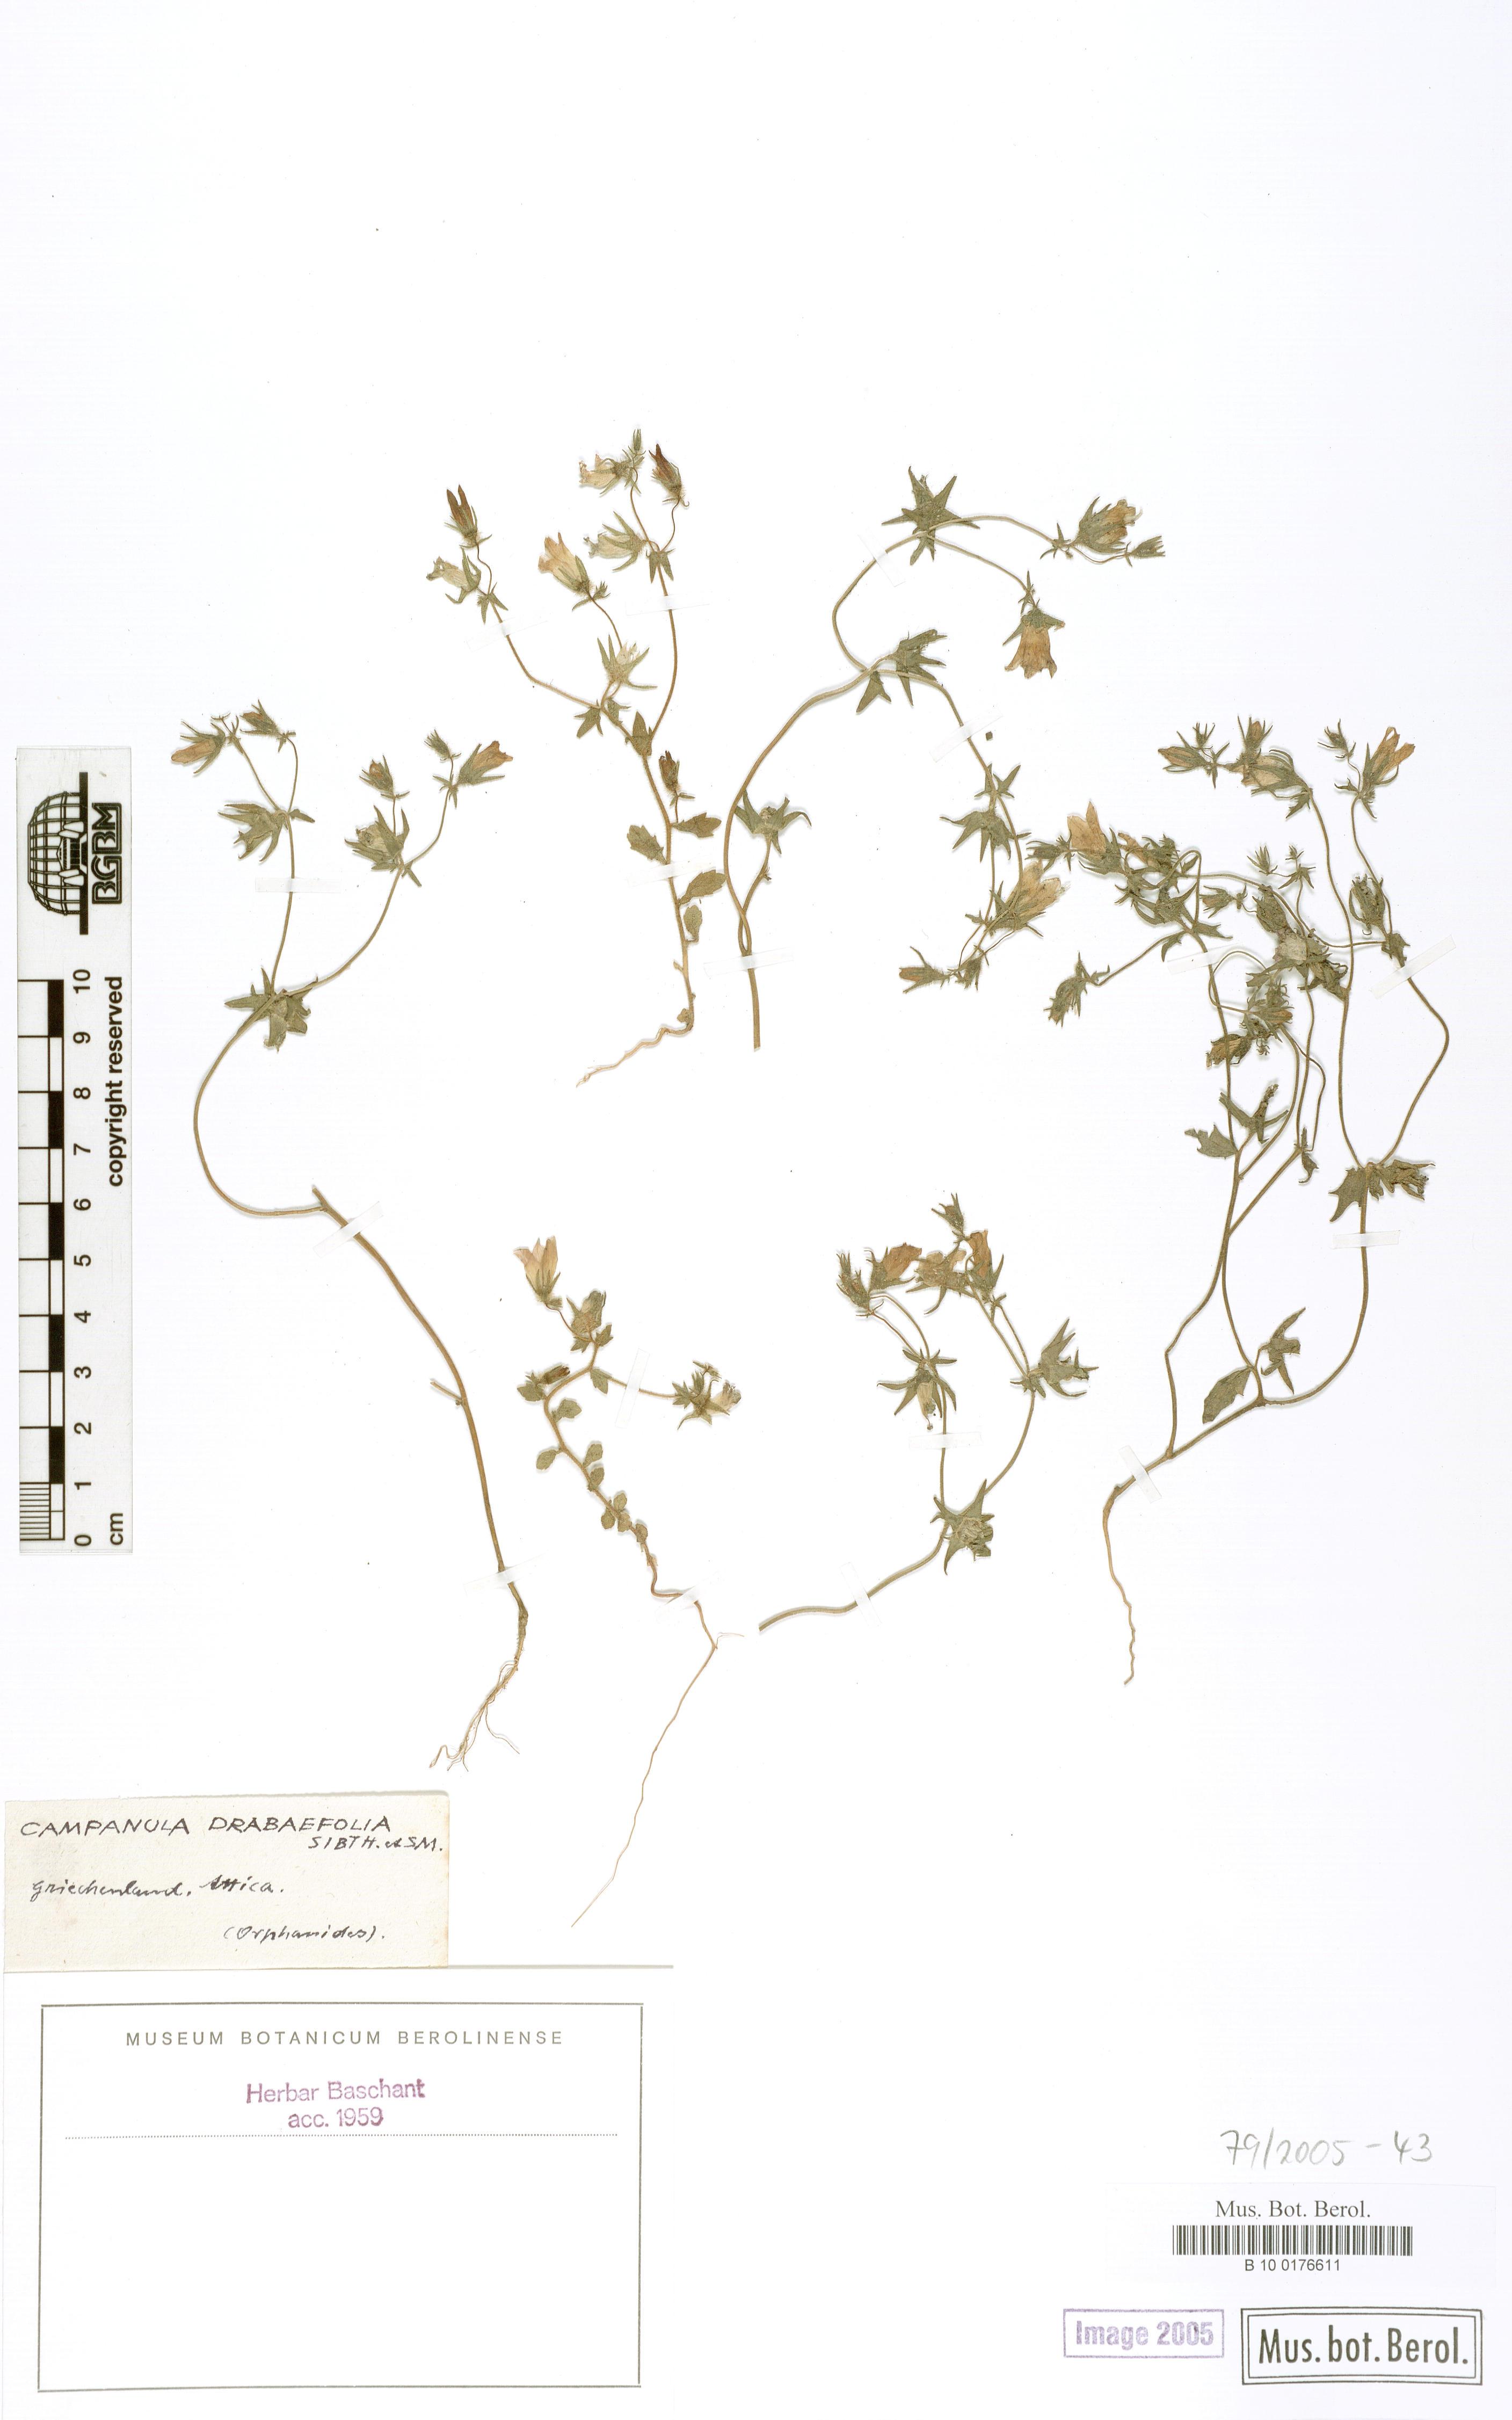 http://ww2.bgbm.org/herbarium/images/B/10/01/76/61/B_10_0176611.jpg